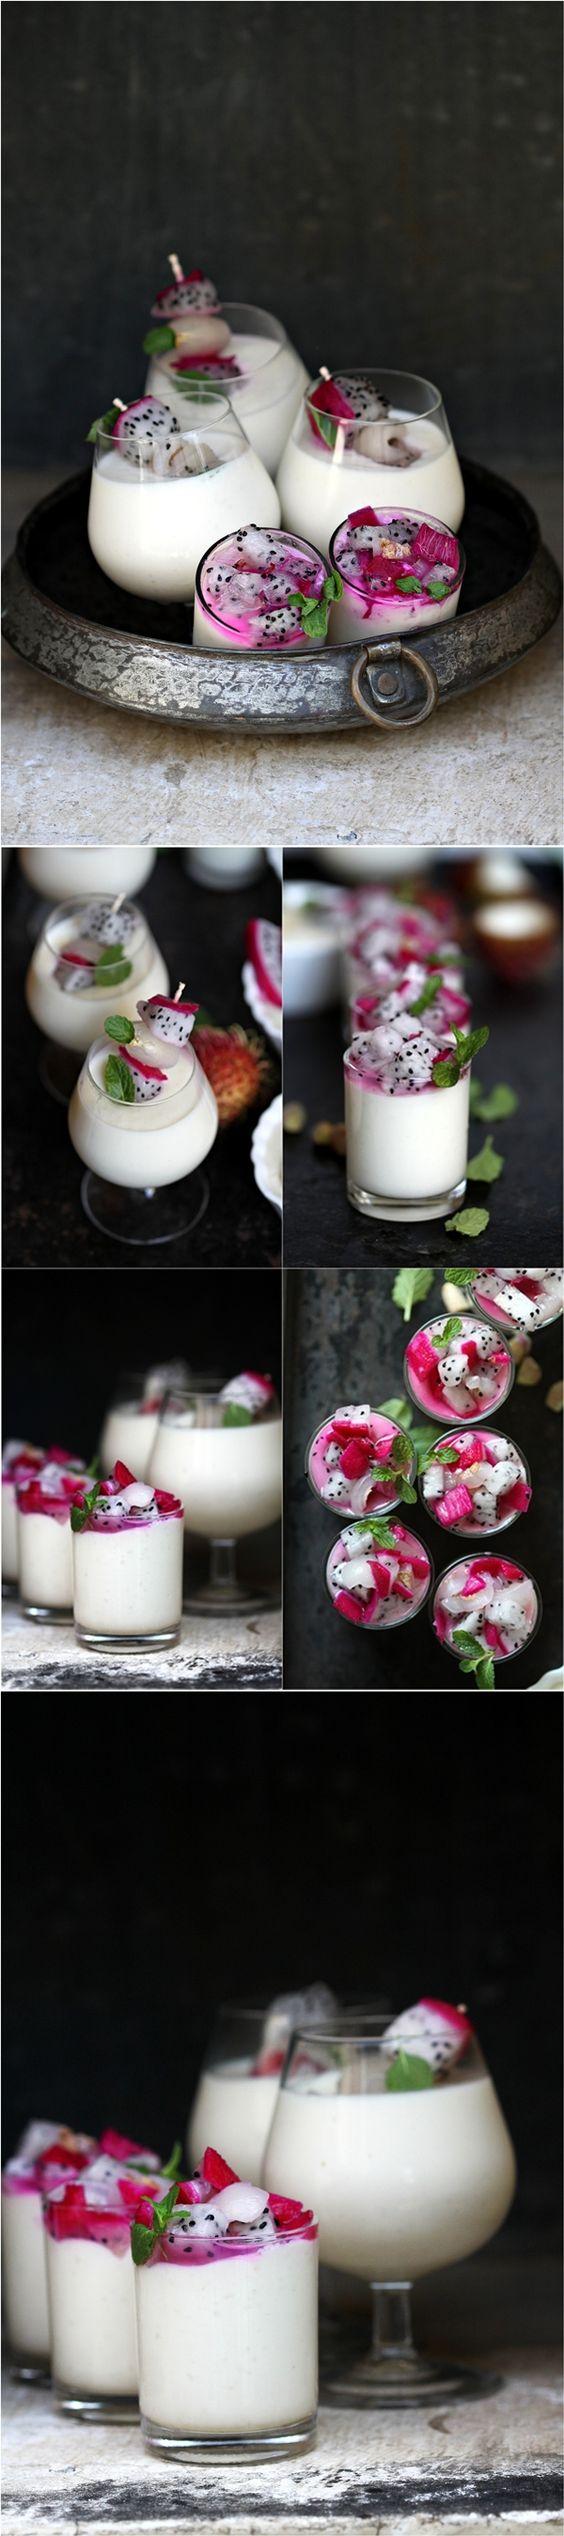 Tropical Coconut Rice Milk Pudding